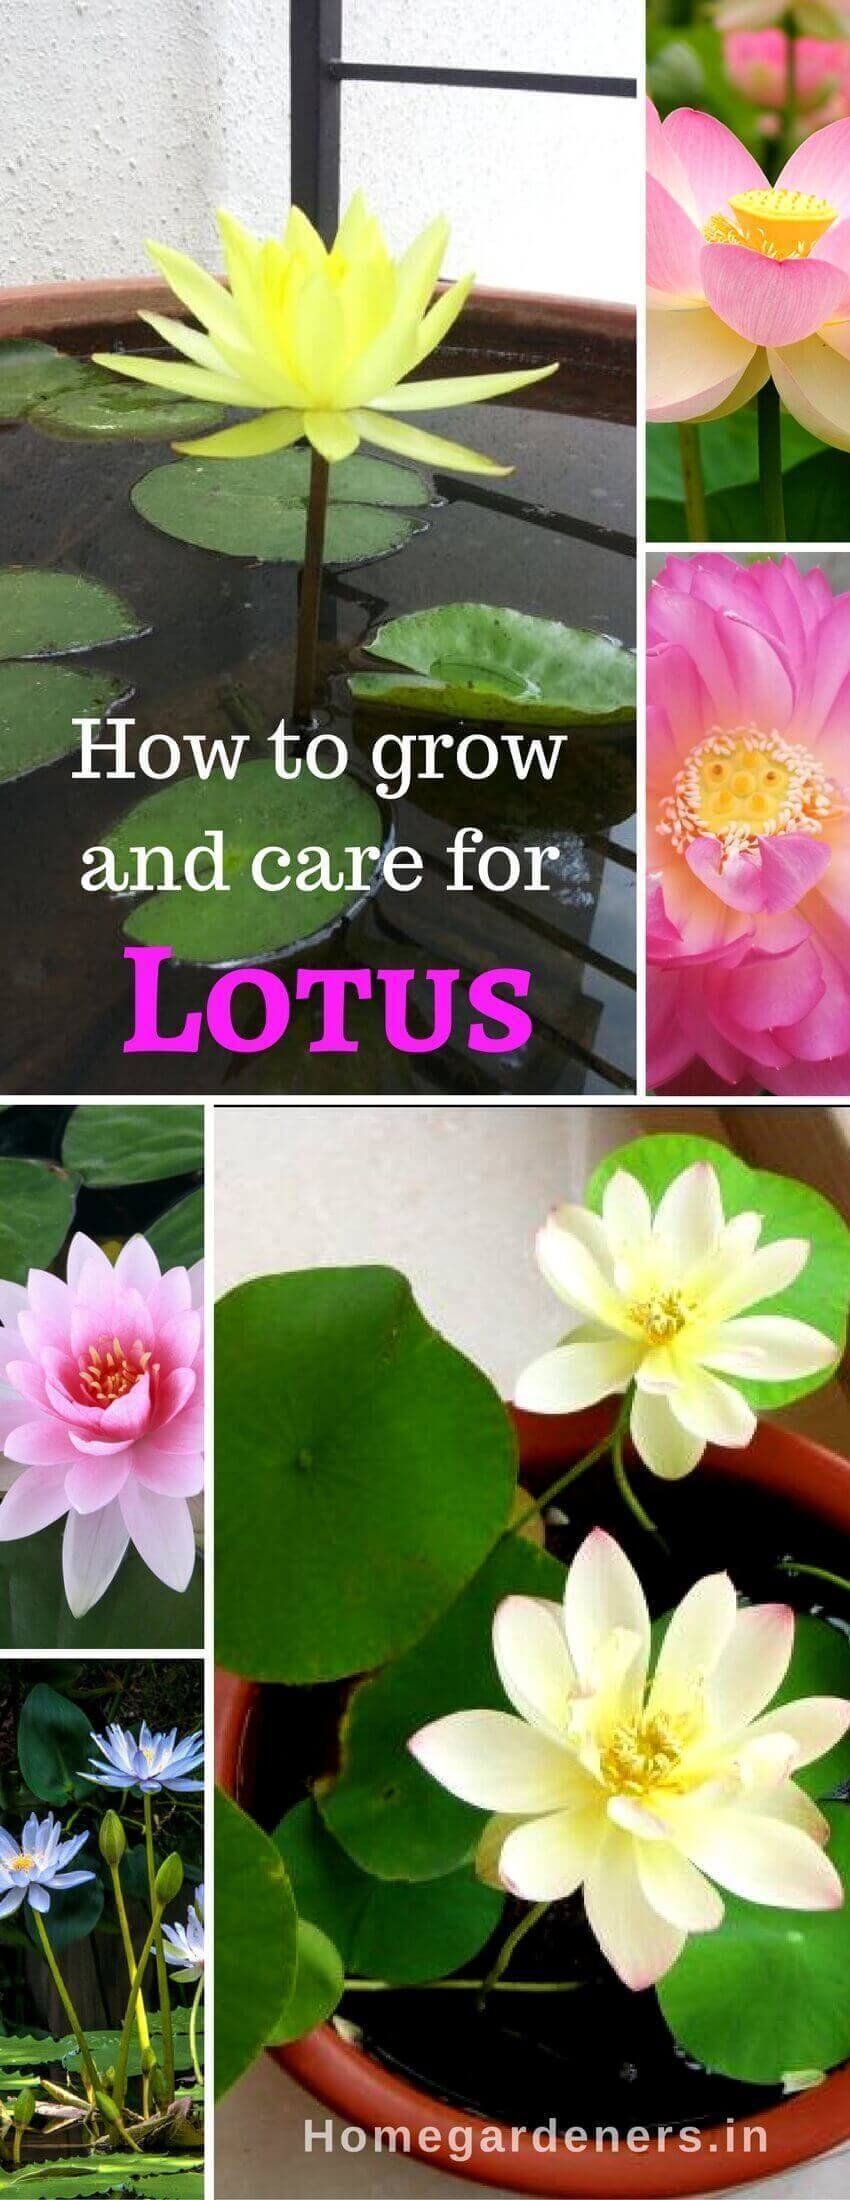 Sacred lotus how to grow and care for lotus plants lotus plants sacred lotus how to grow and care for lotus plants izmirmasajfo